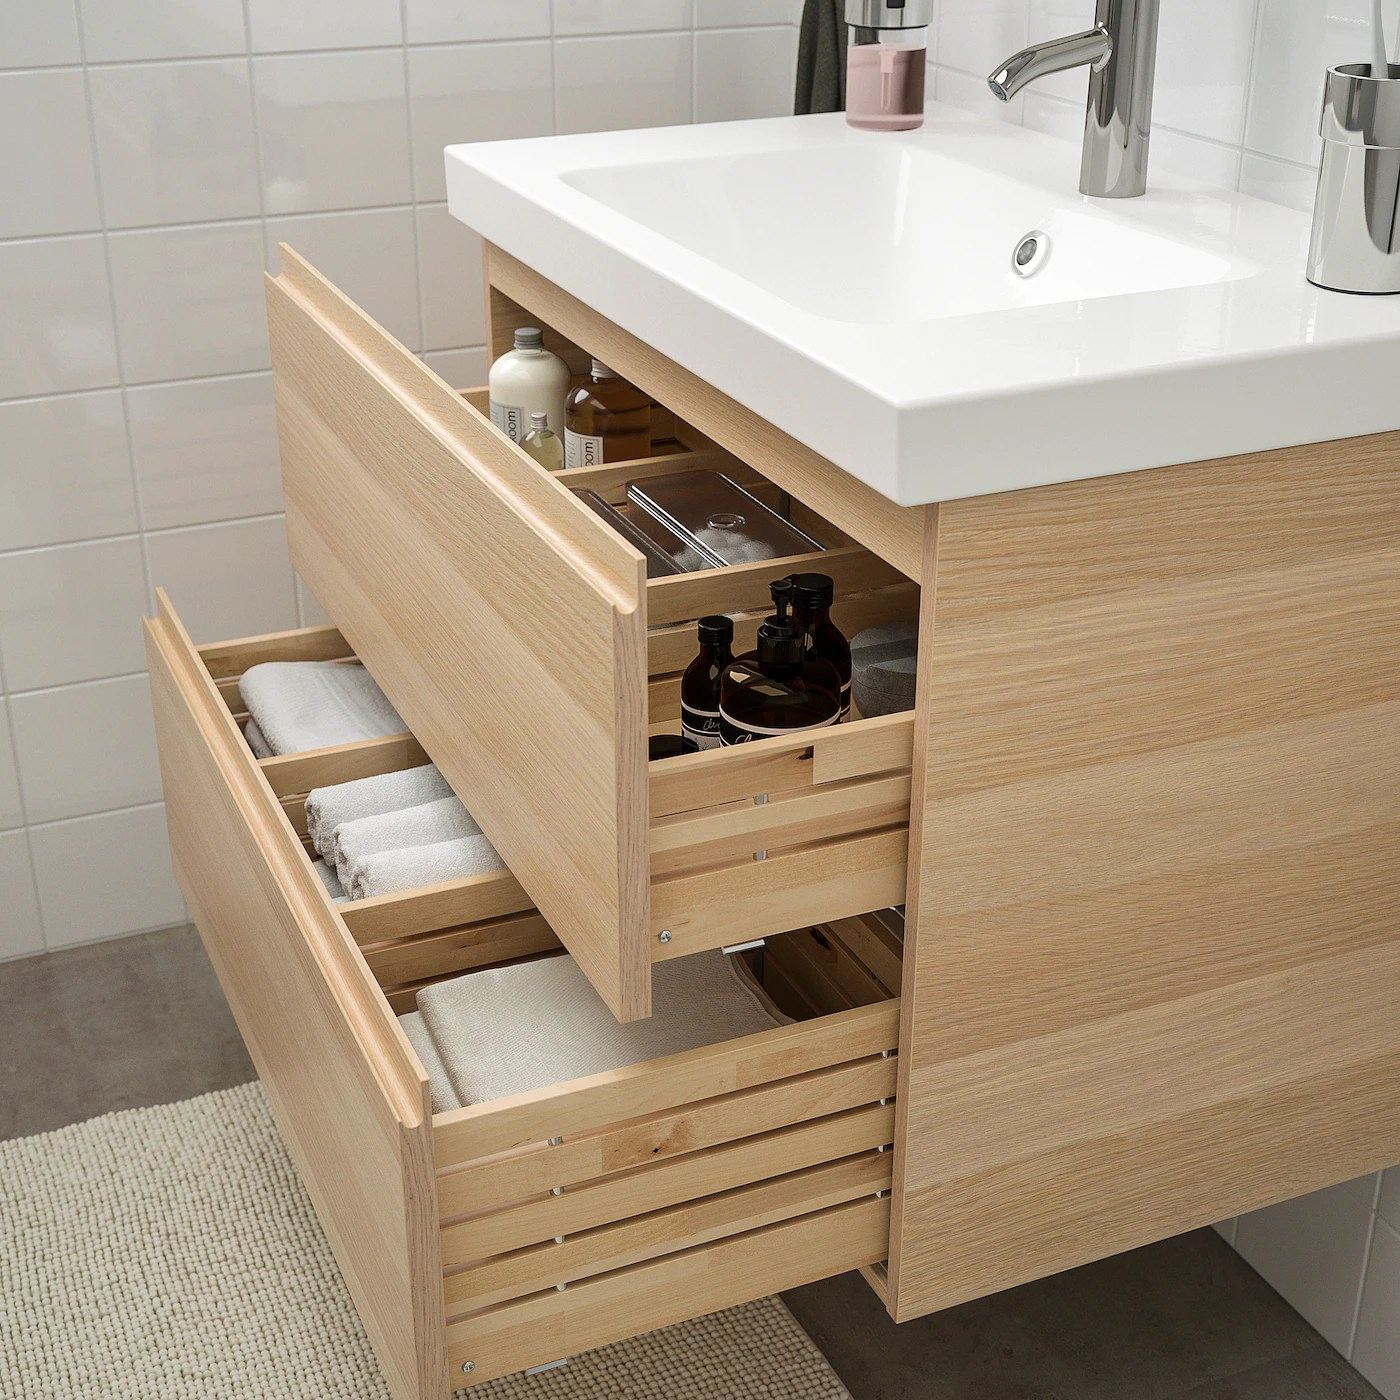 godmorgon odensvik mobilier salle de bain 4 pieces effet chene blanchi dalskar mitigeur lavabo 83 cm